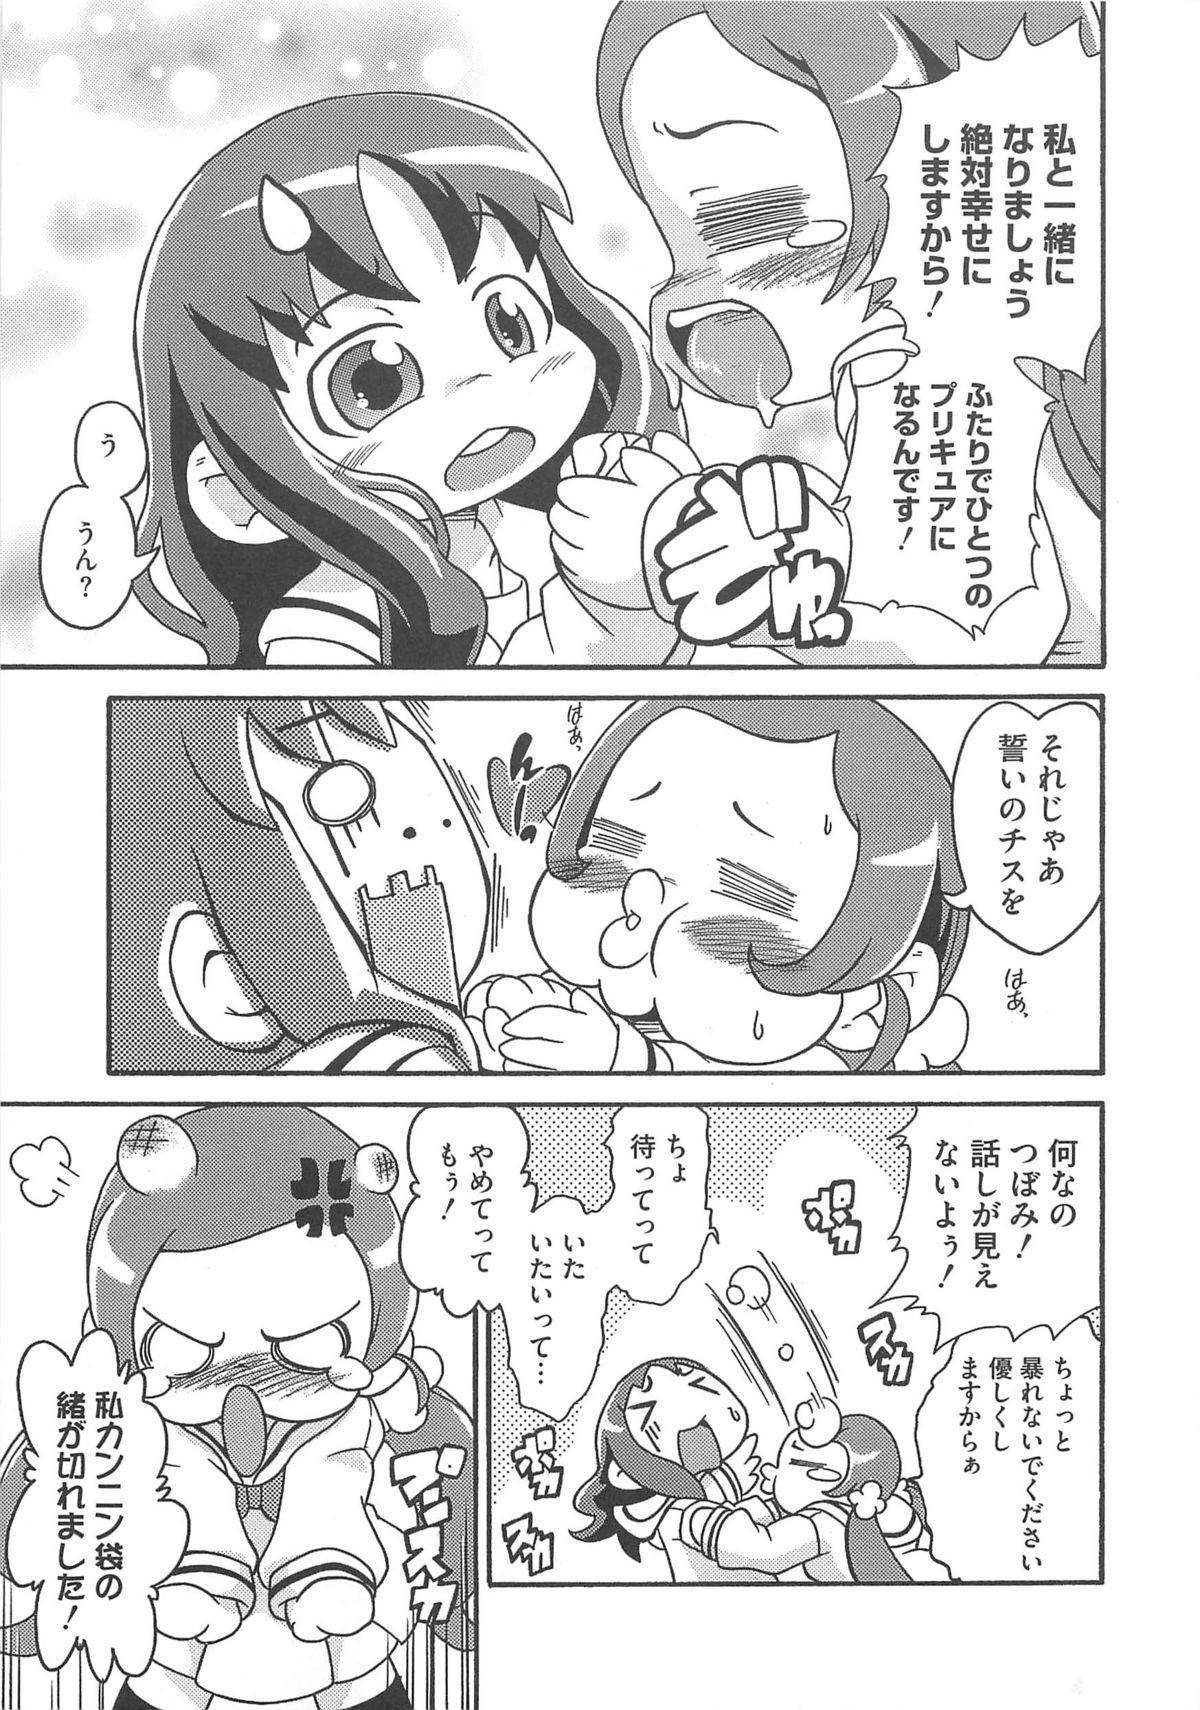 Cure Bitch Sakura!! HC 115